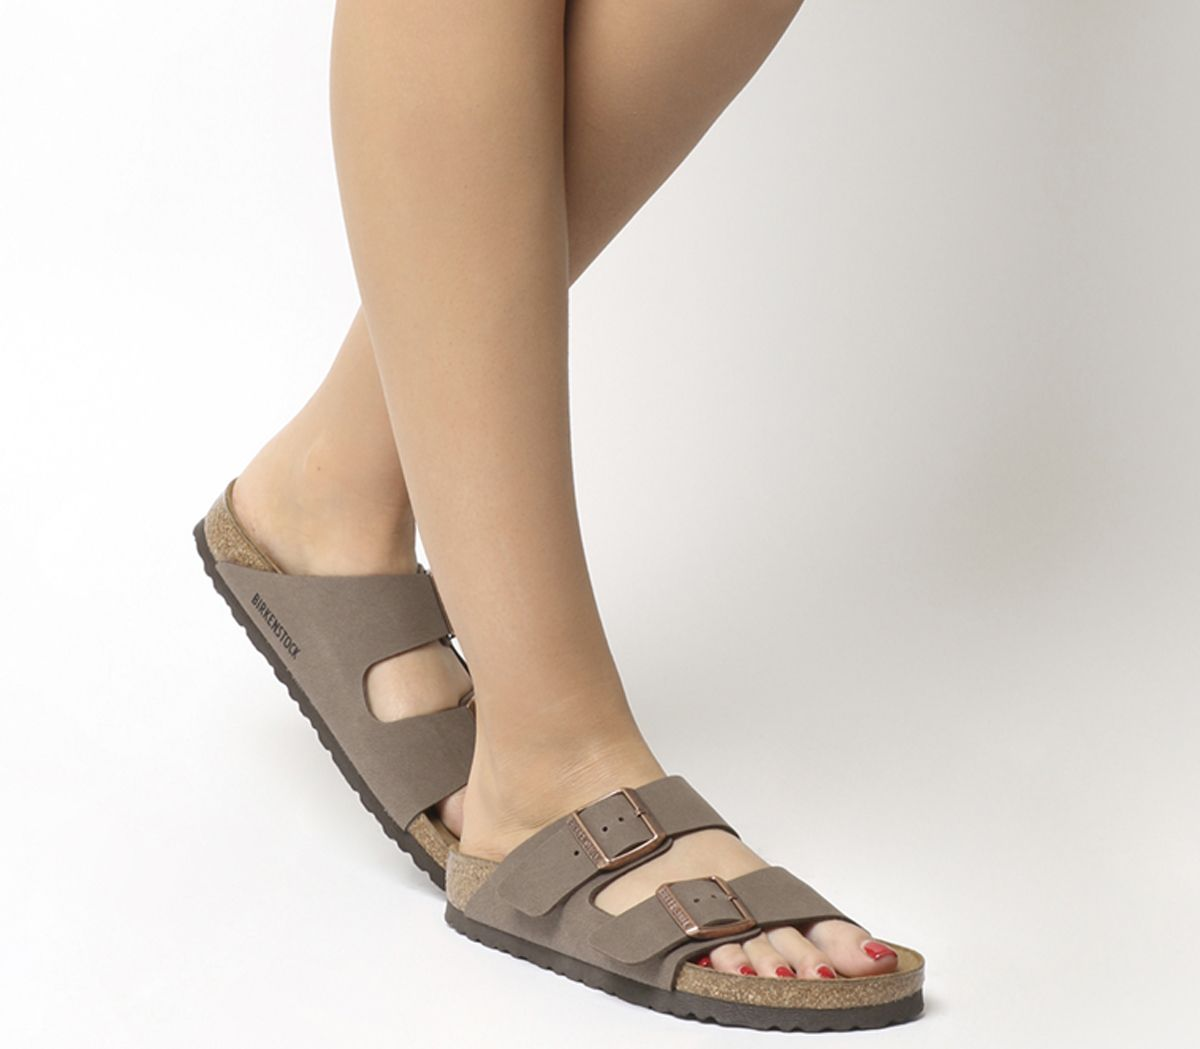 new concept 54b2c 5a16d Dettagli su Donna Birkenstock Arizona Due Sandali con Cinturino Color Moca  Birko-Flor